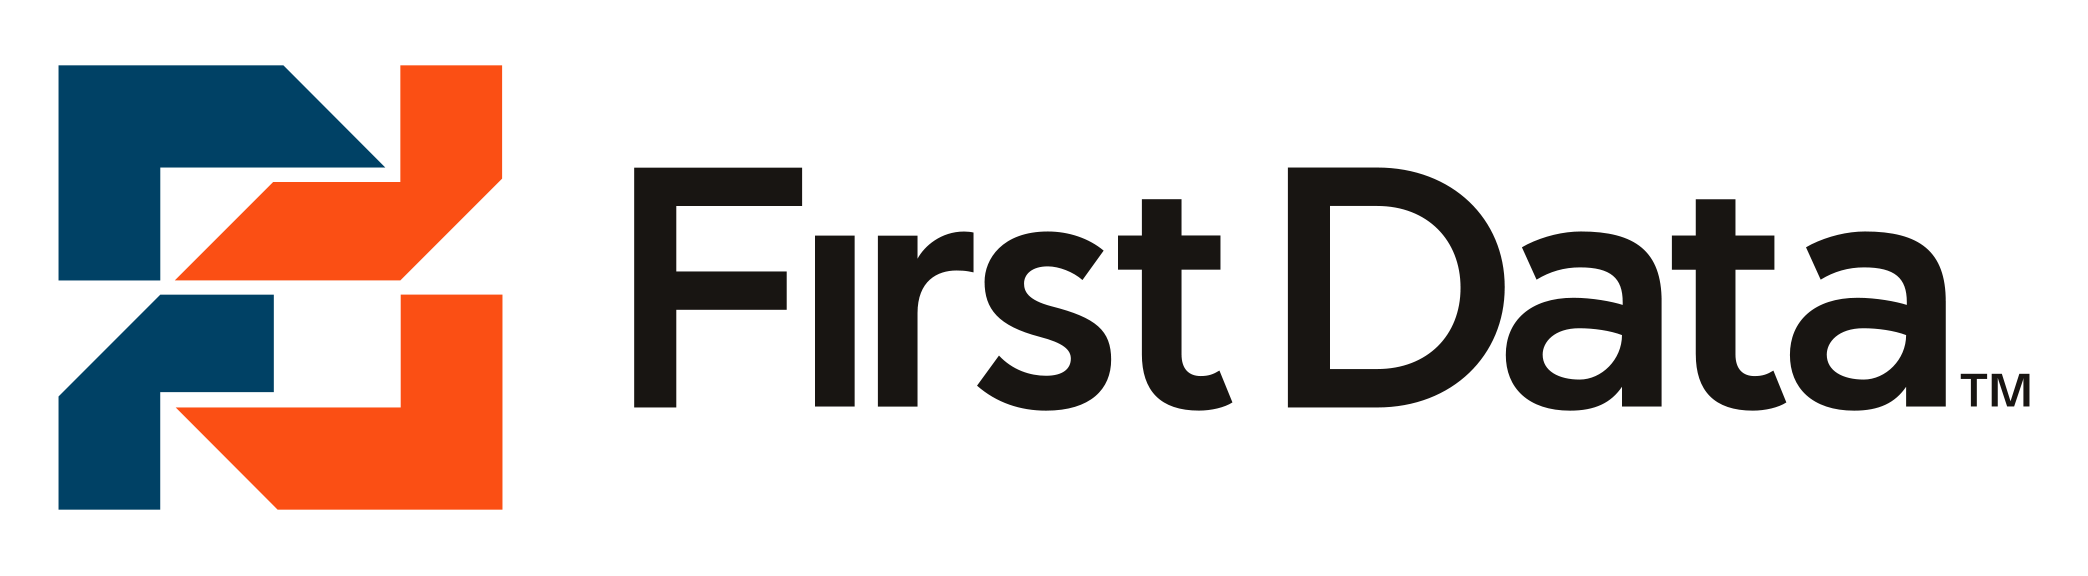 firstdatalogo3